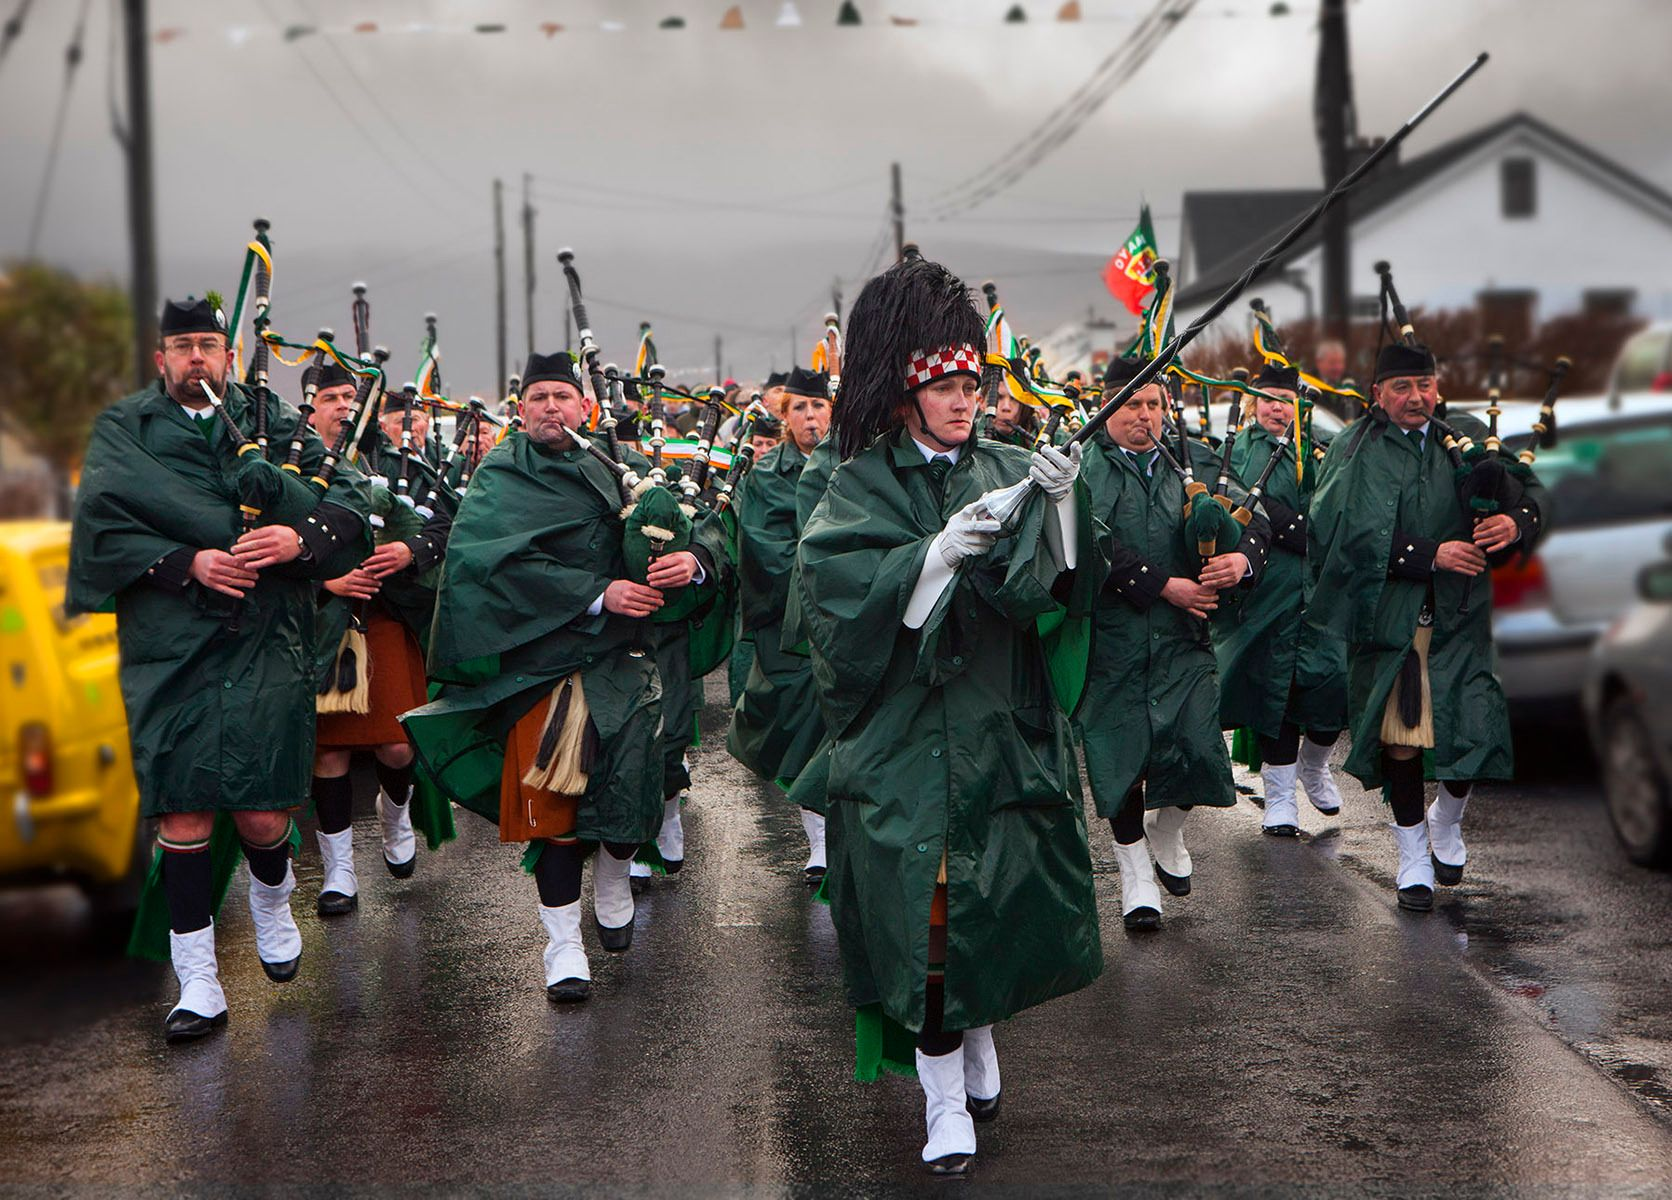 Saint Patricks Parade Achill Island Ireland, 2013